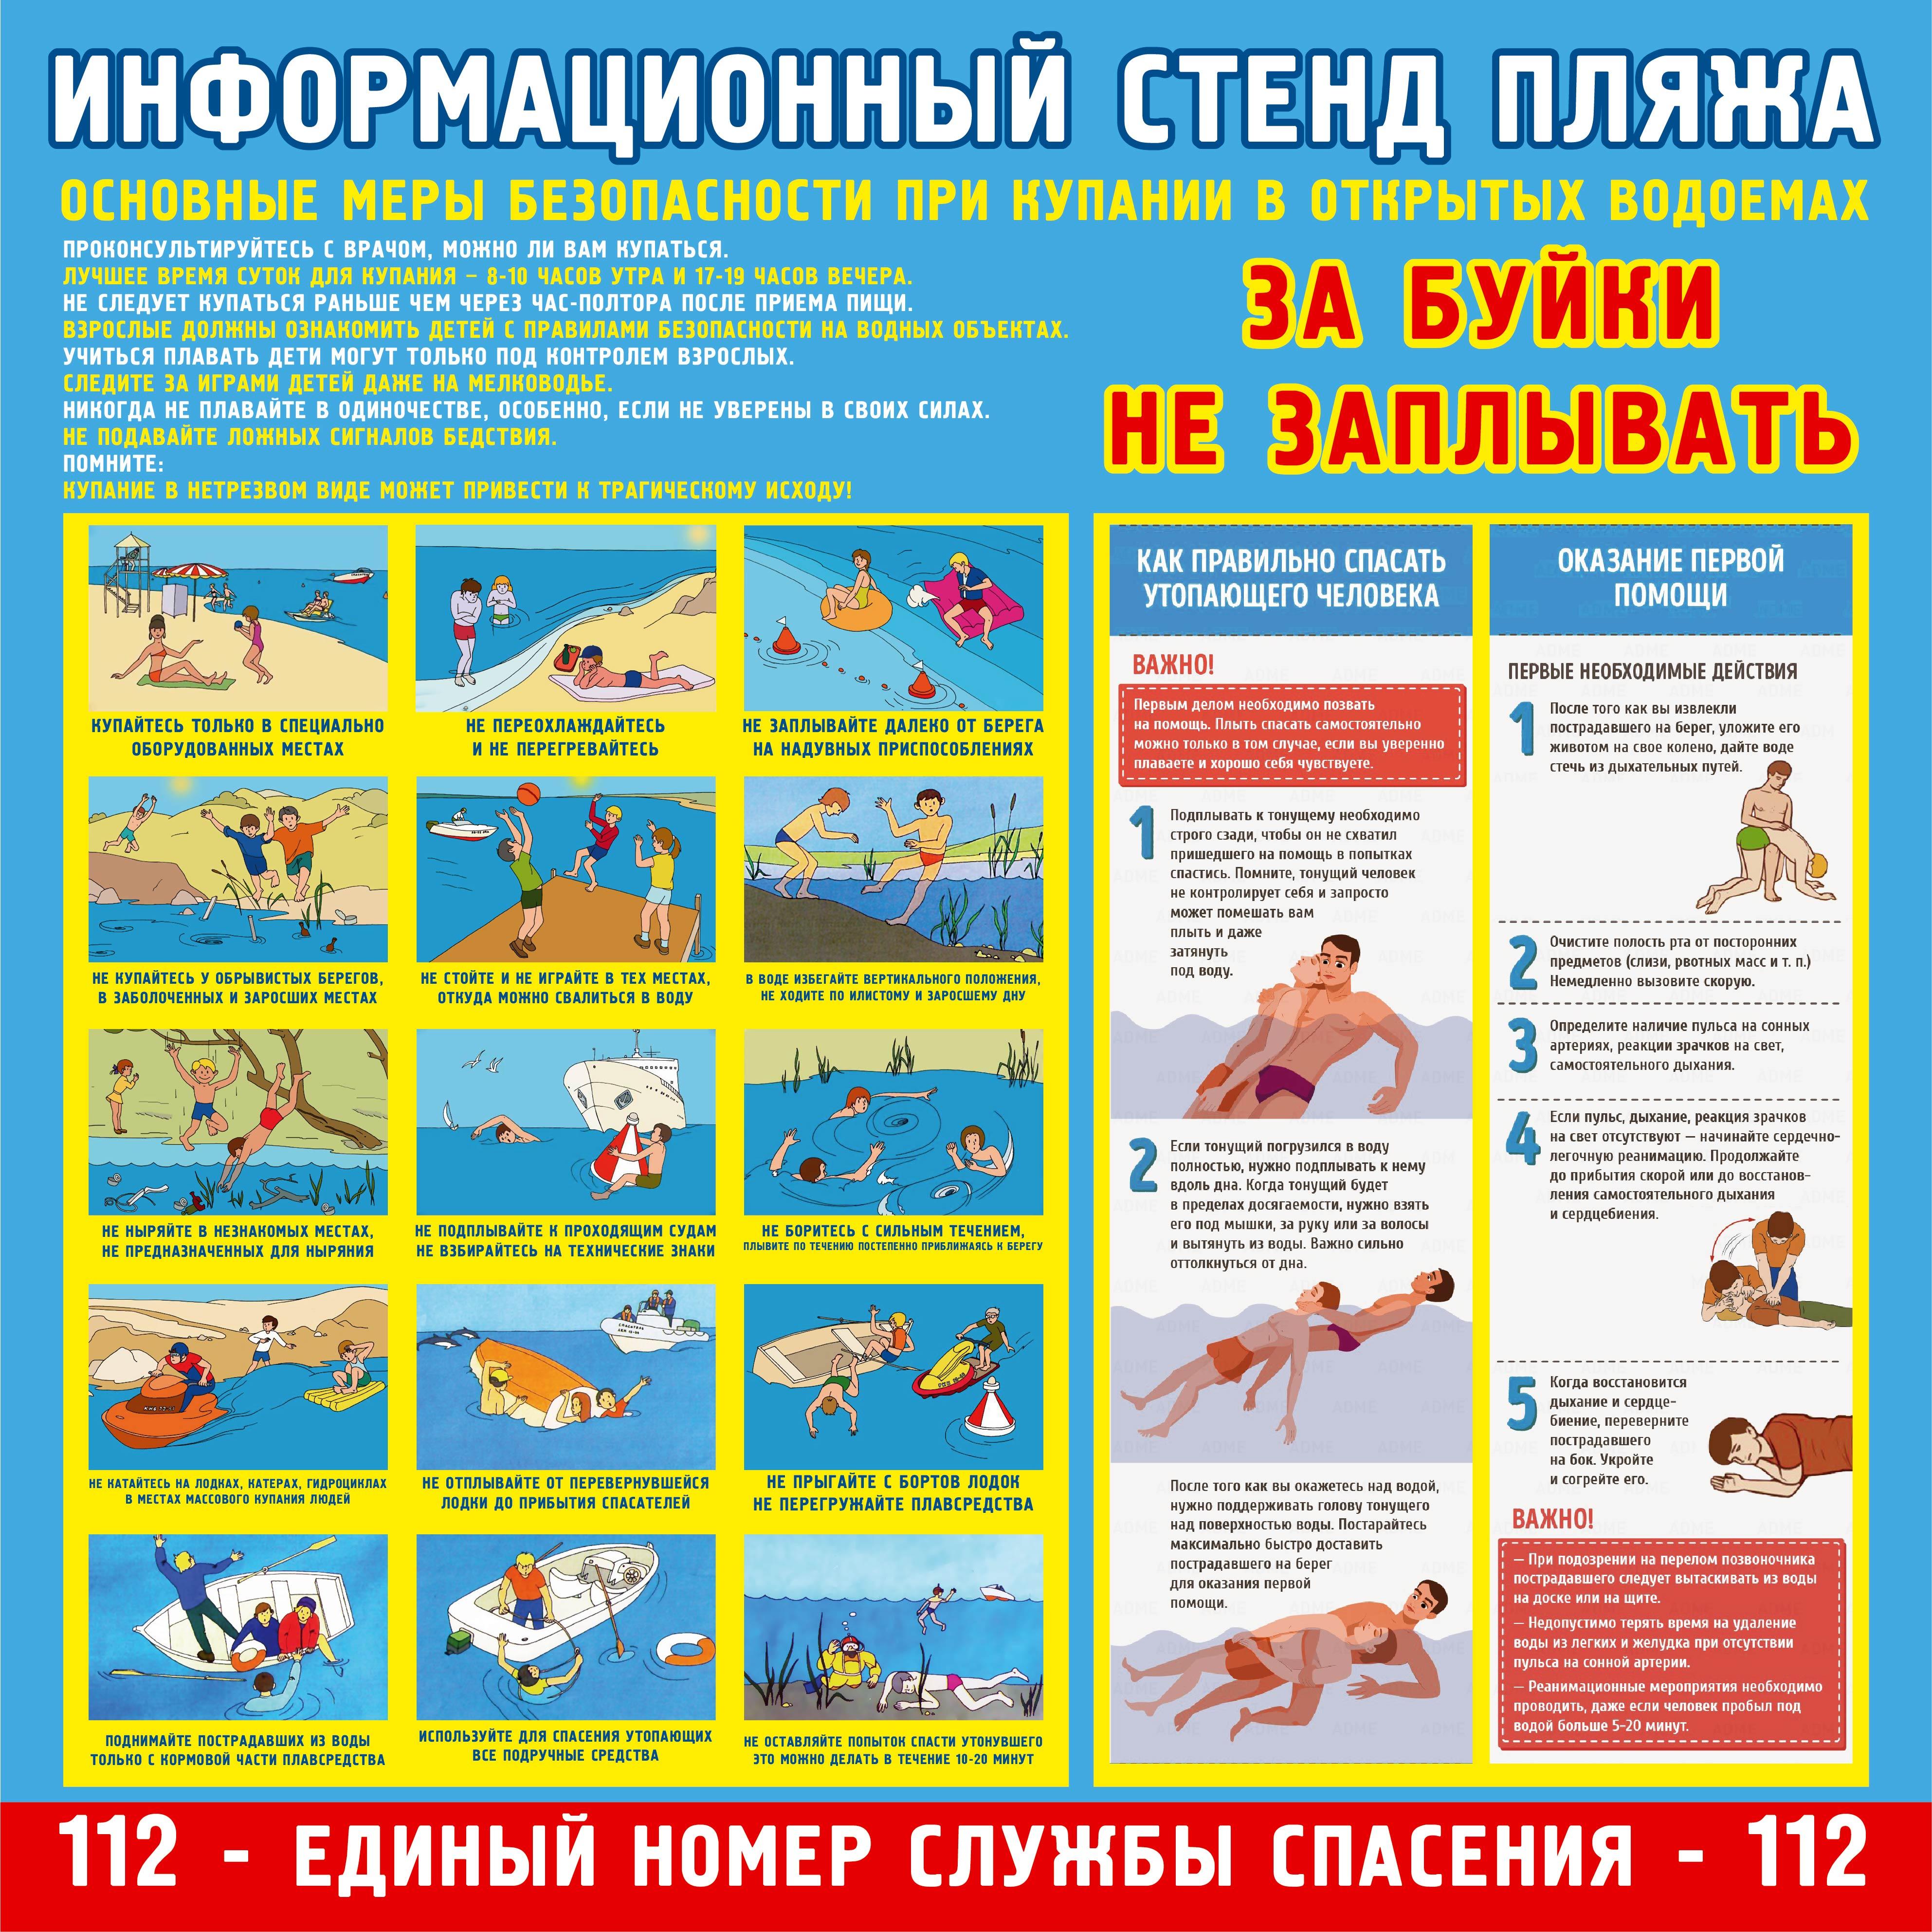 Правила безопасности с ребенком на отдыхе